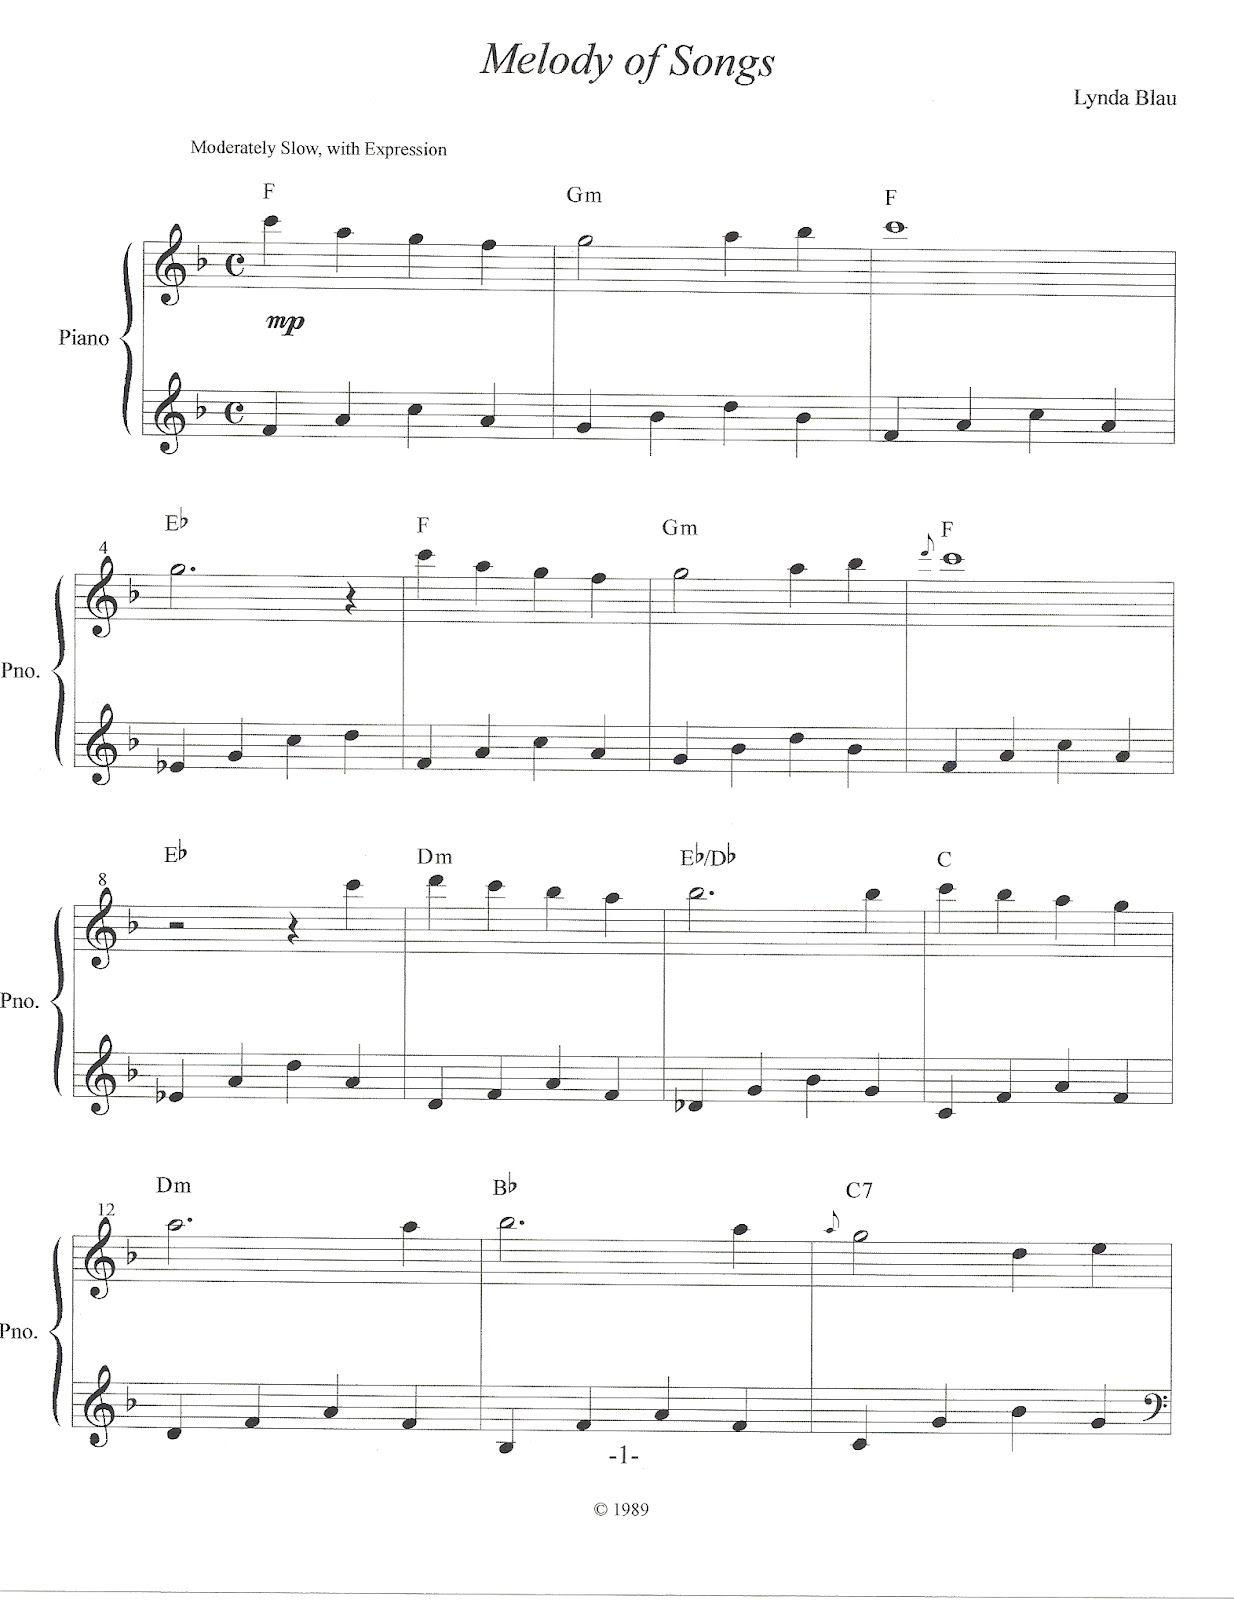 Melody Of Songs Sheet Music Songs Piano Sheet Music [ 1600 x 1234 Pixel ]